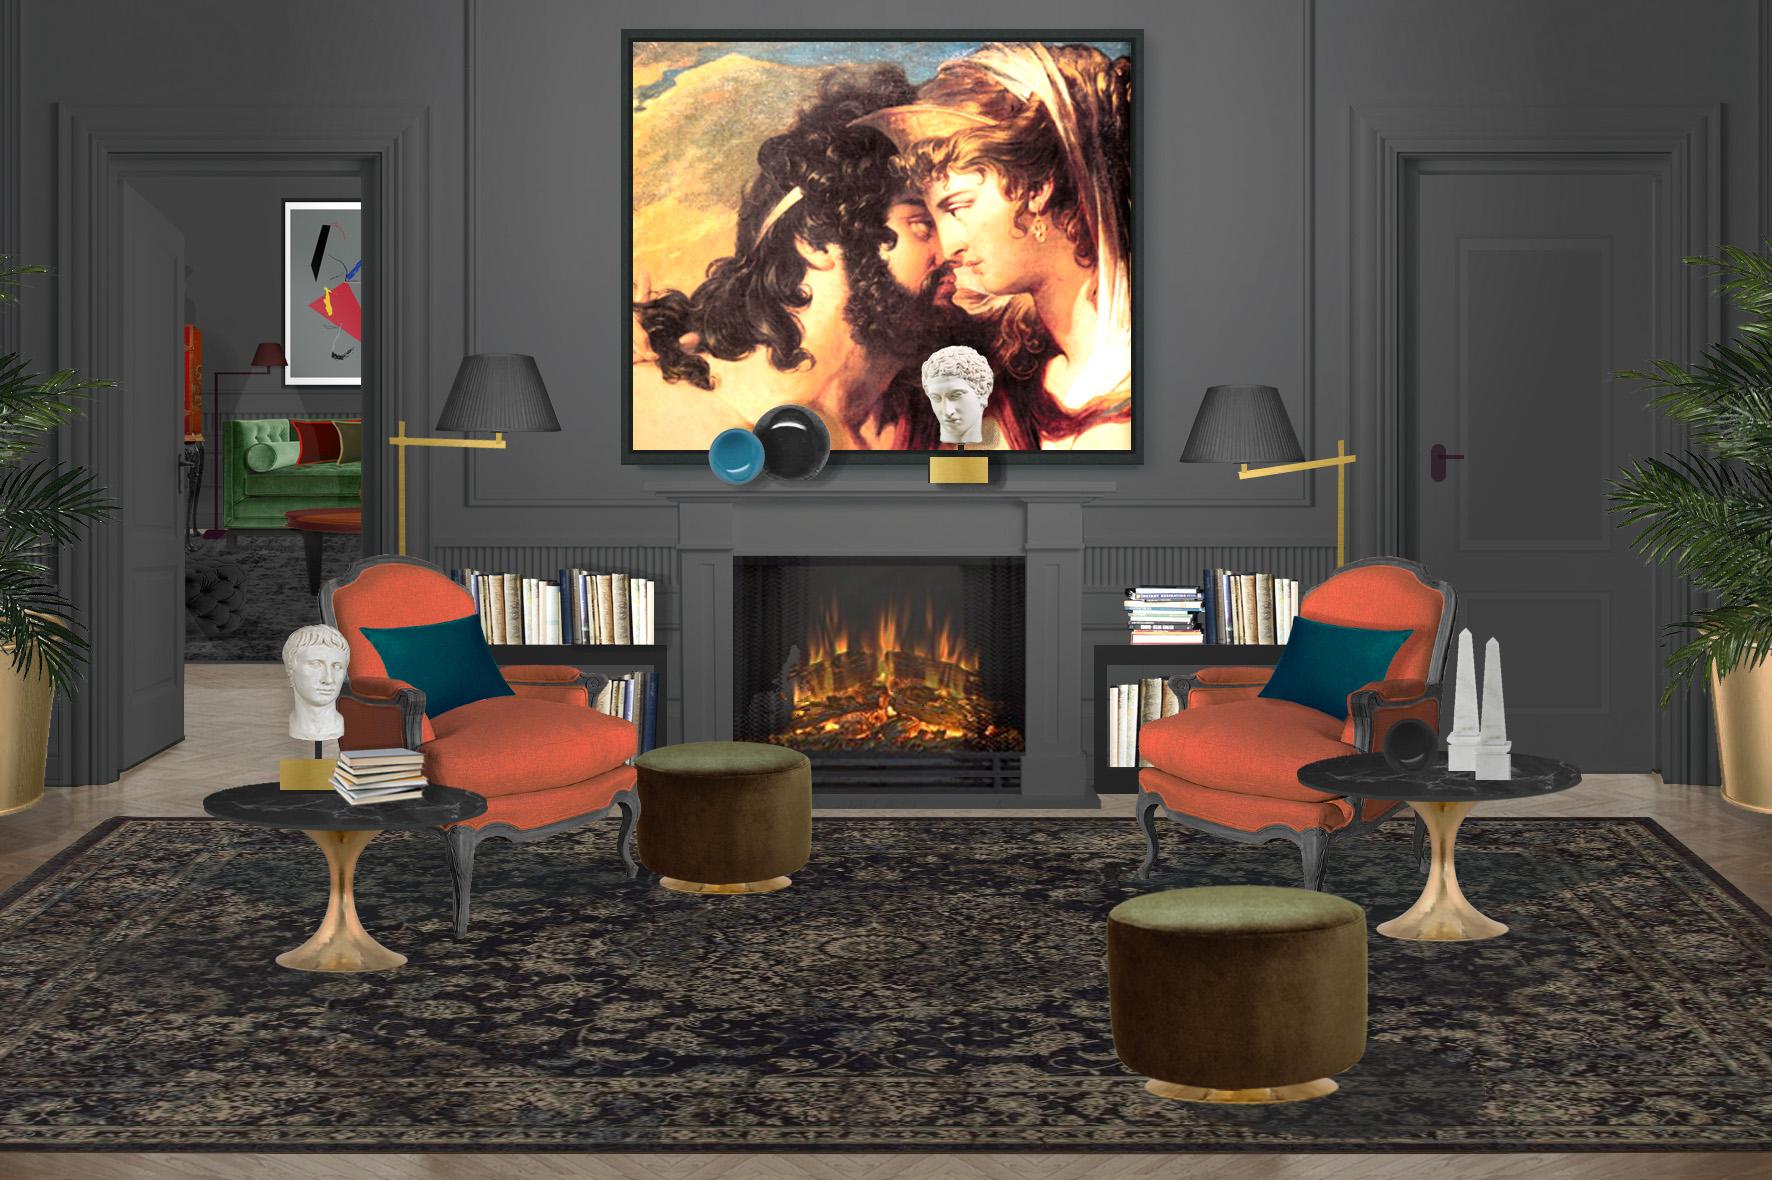 Splendid calid interiors with original art prints.jpg